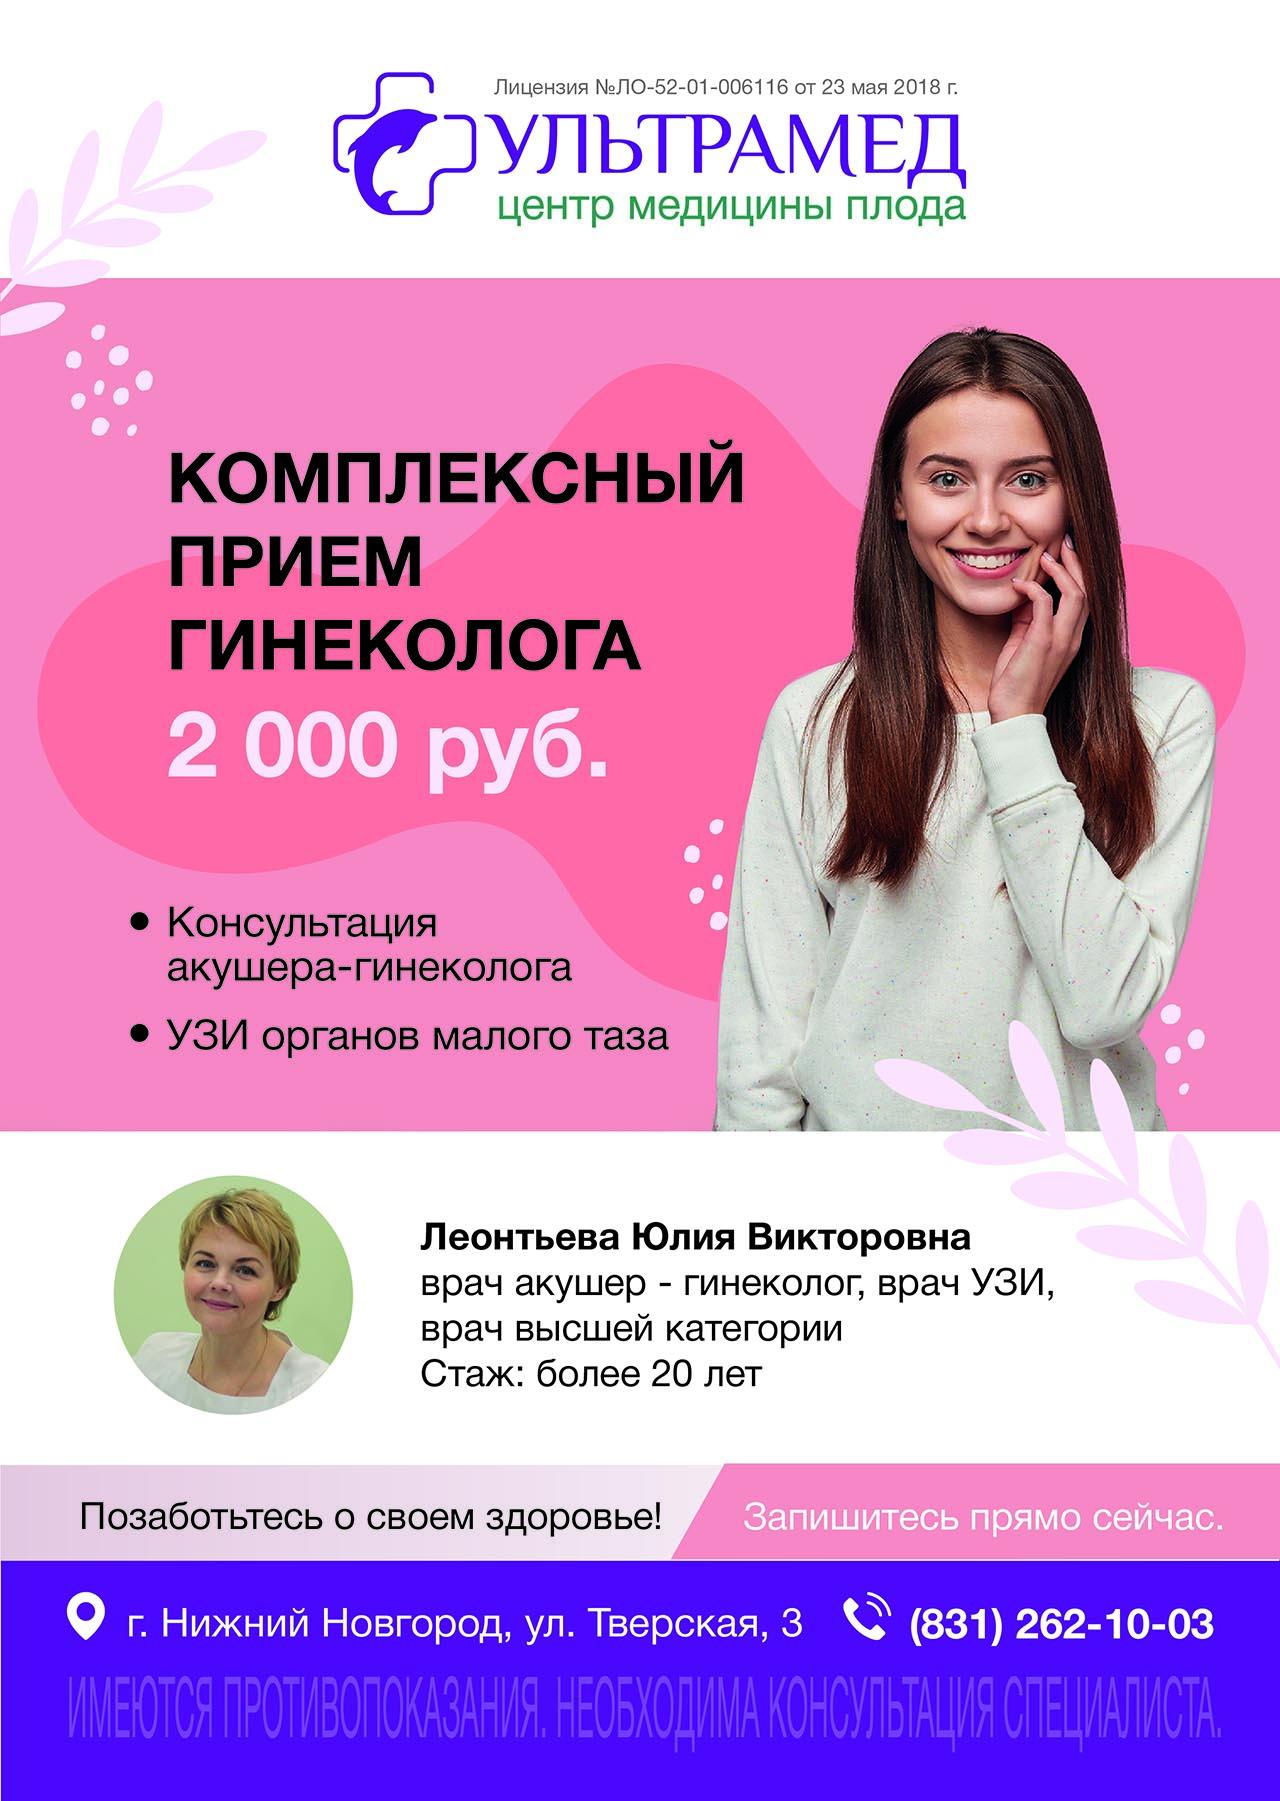 Прием гинеколога + УЗИ малого таза ВСЕГО ЗА  2000 руб.